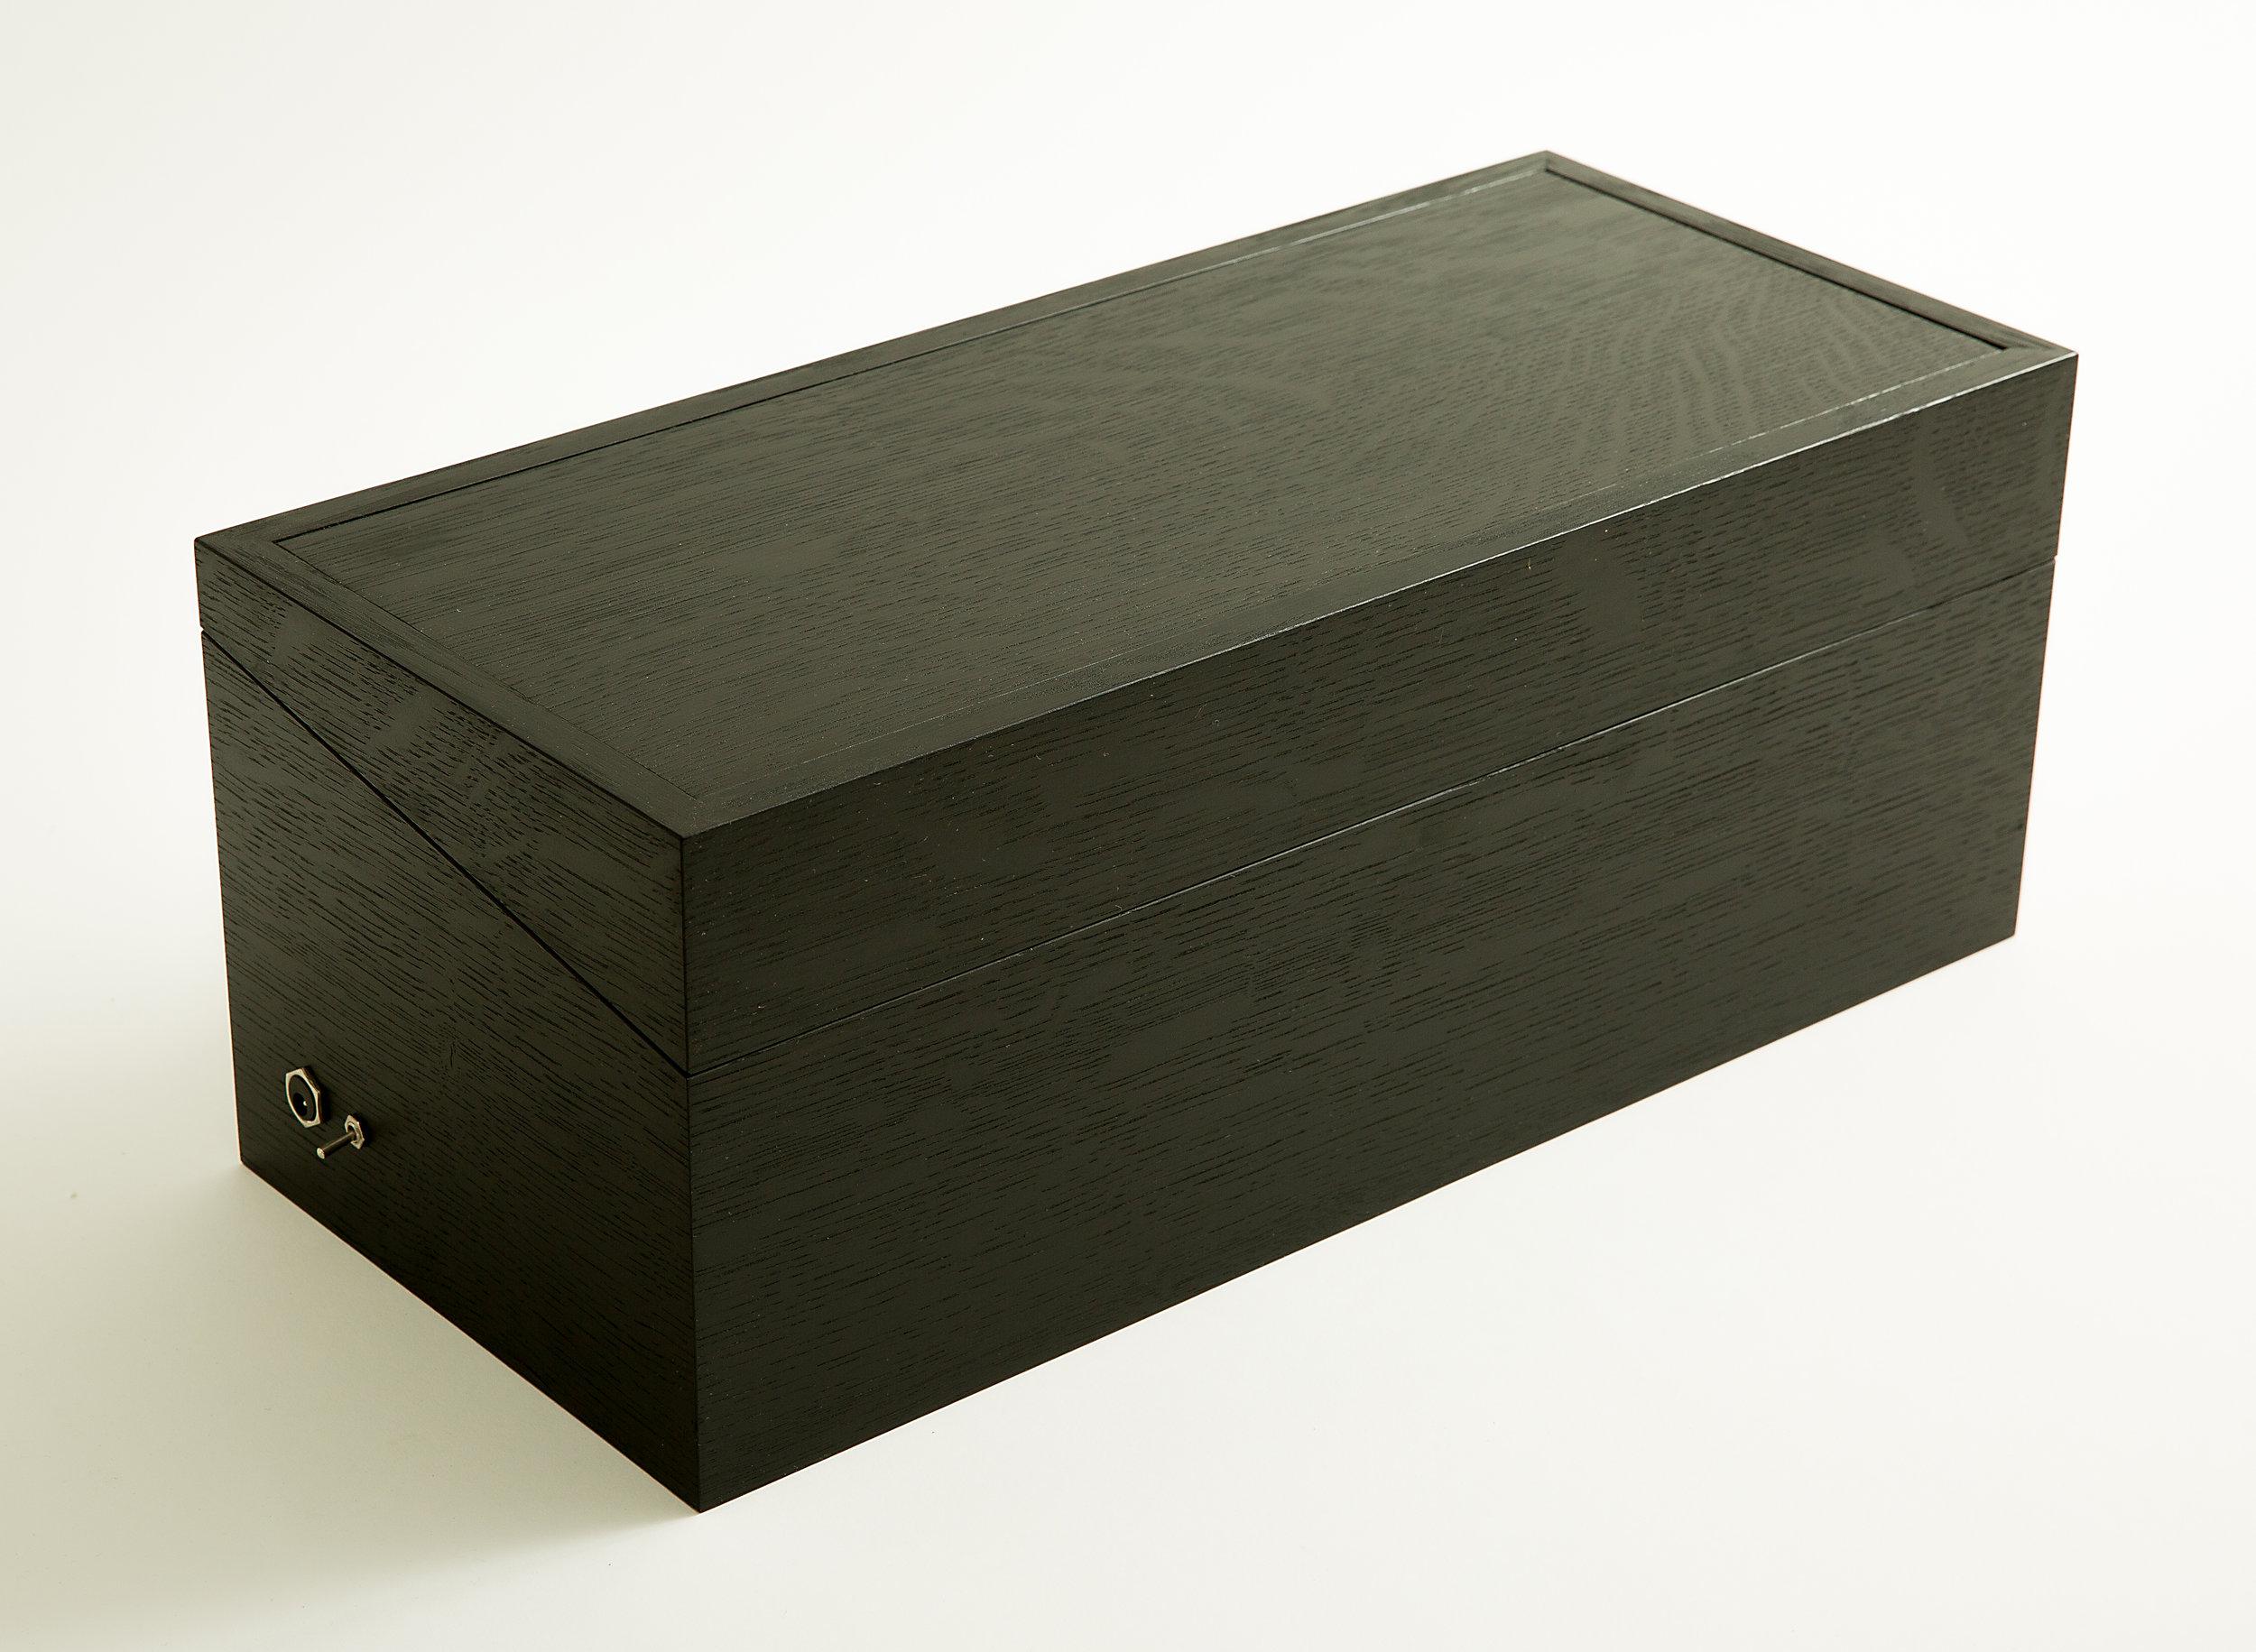 Emma Senft, Montreal, Custom, Wood, Fine Furniture, Solid Oak, Reclaimed Wood, Modern finish, analog synthesizer